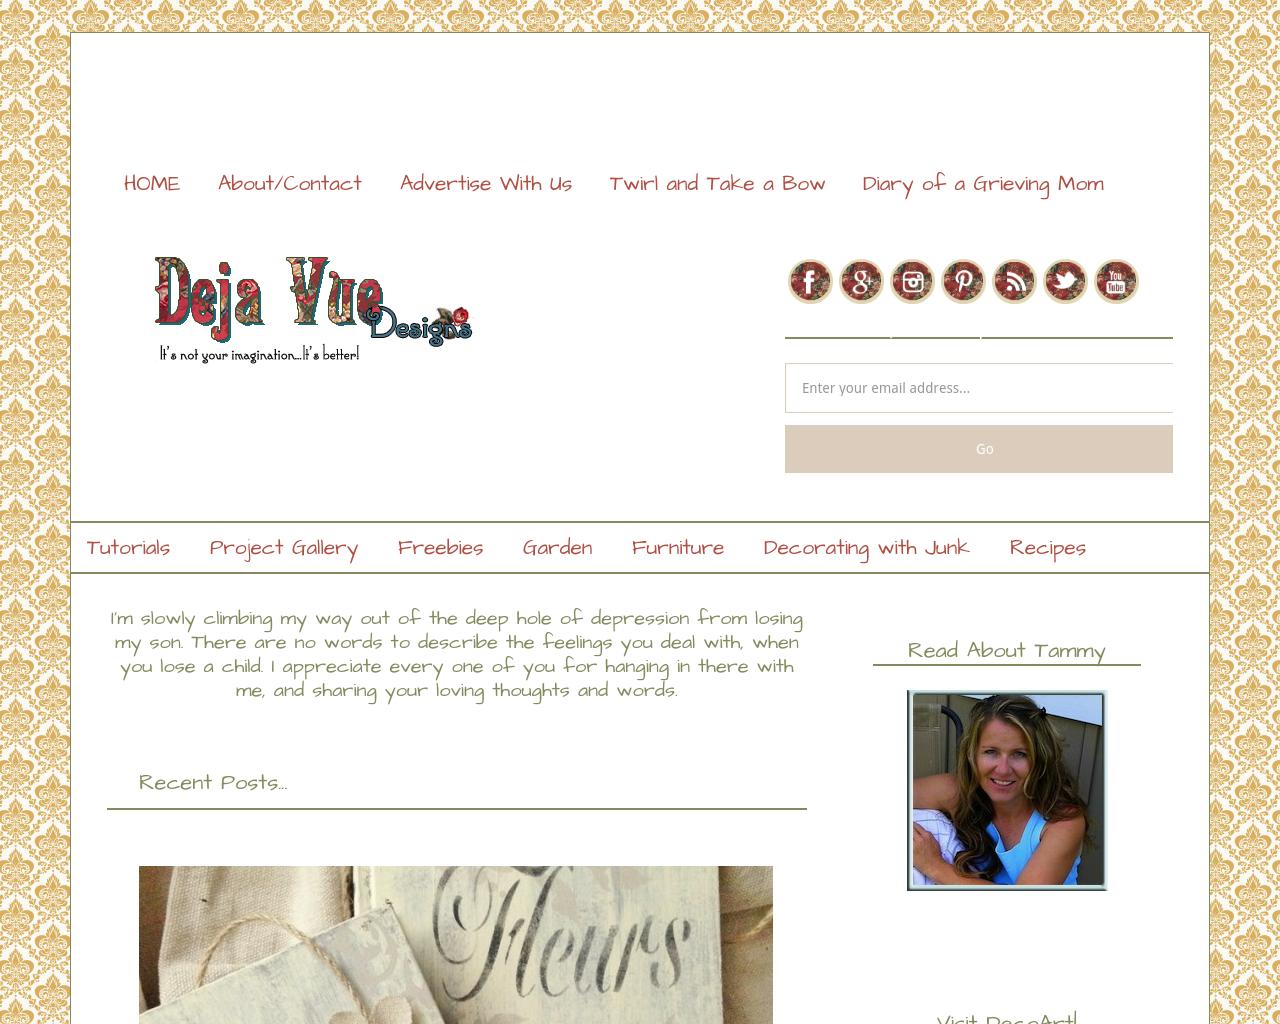 Deja-Vue-Designs-Advertising-Reviews-Pricing